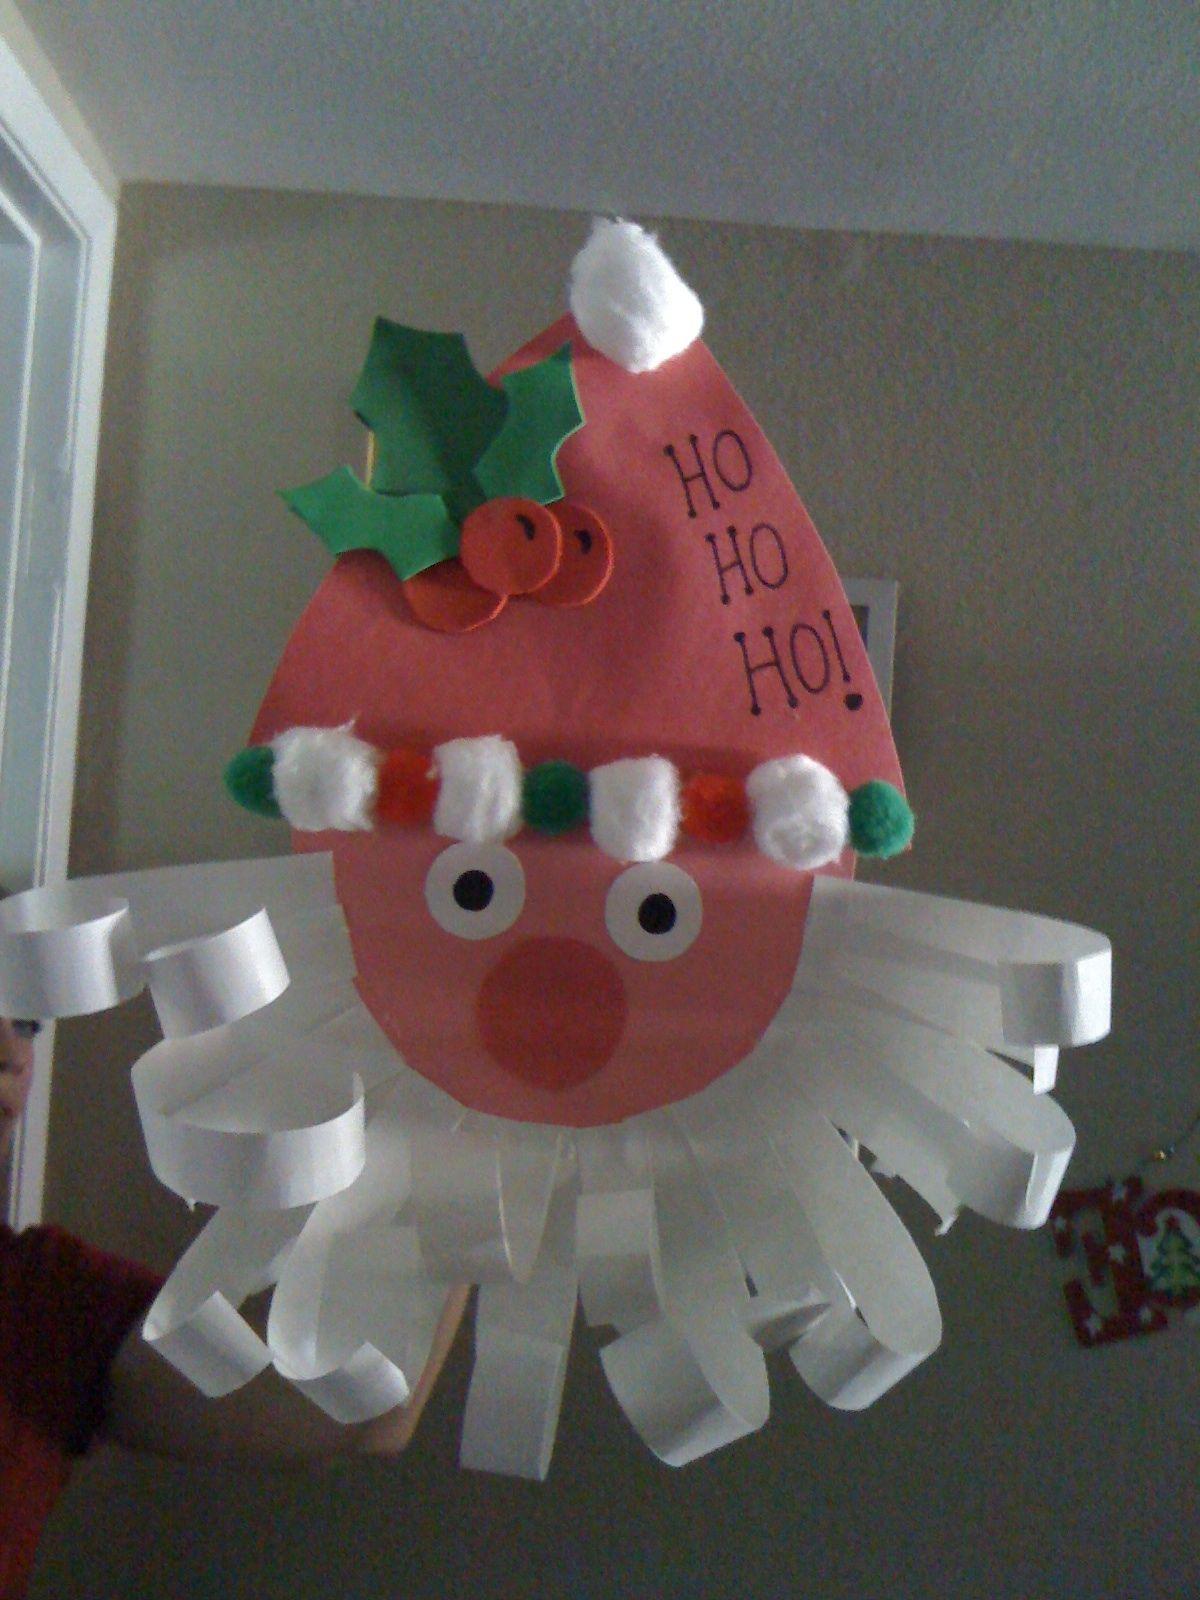 Construction paper Santa. Easy preschool Christmas craft